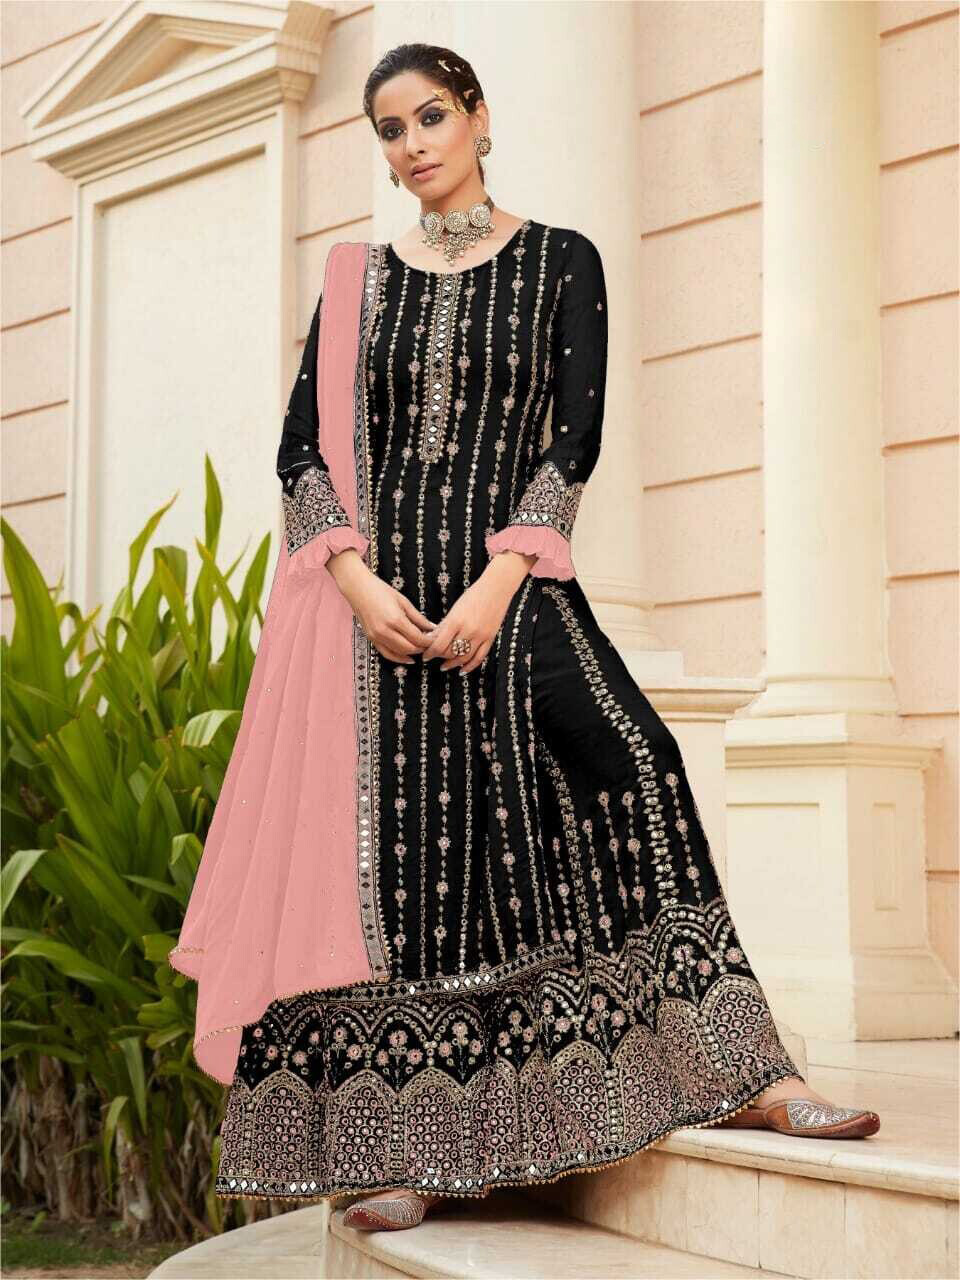 Diamond Mirror Work Embroidered Georgette Sharara Suit In Black Pink